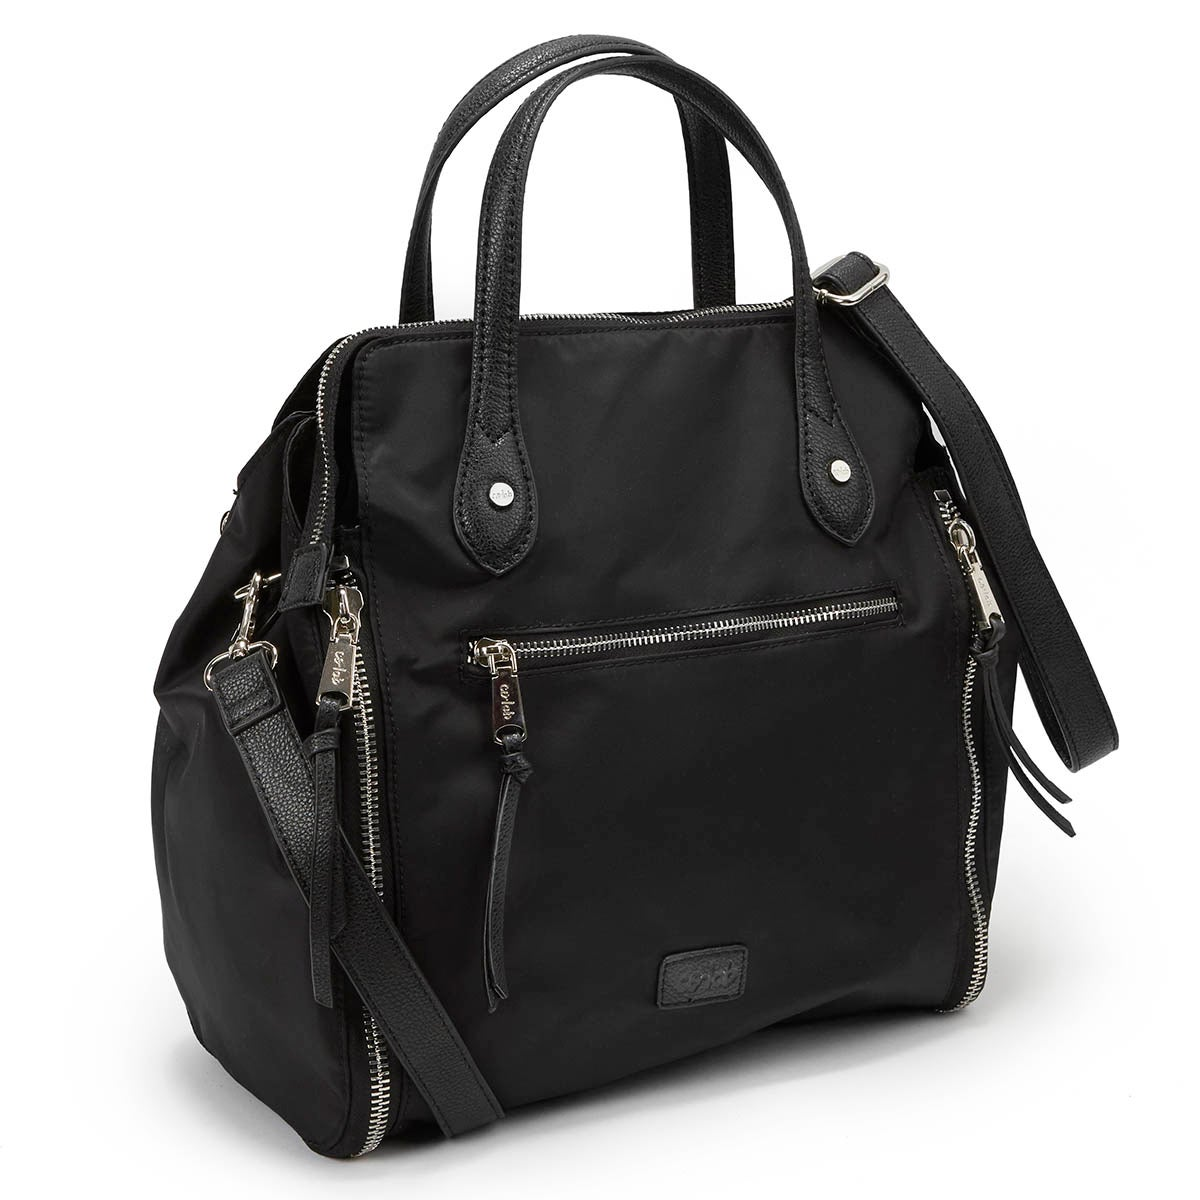 Ld Wear Everywhere blk crossbody satchel